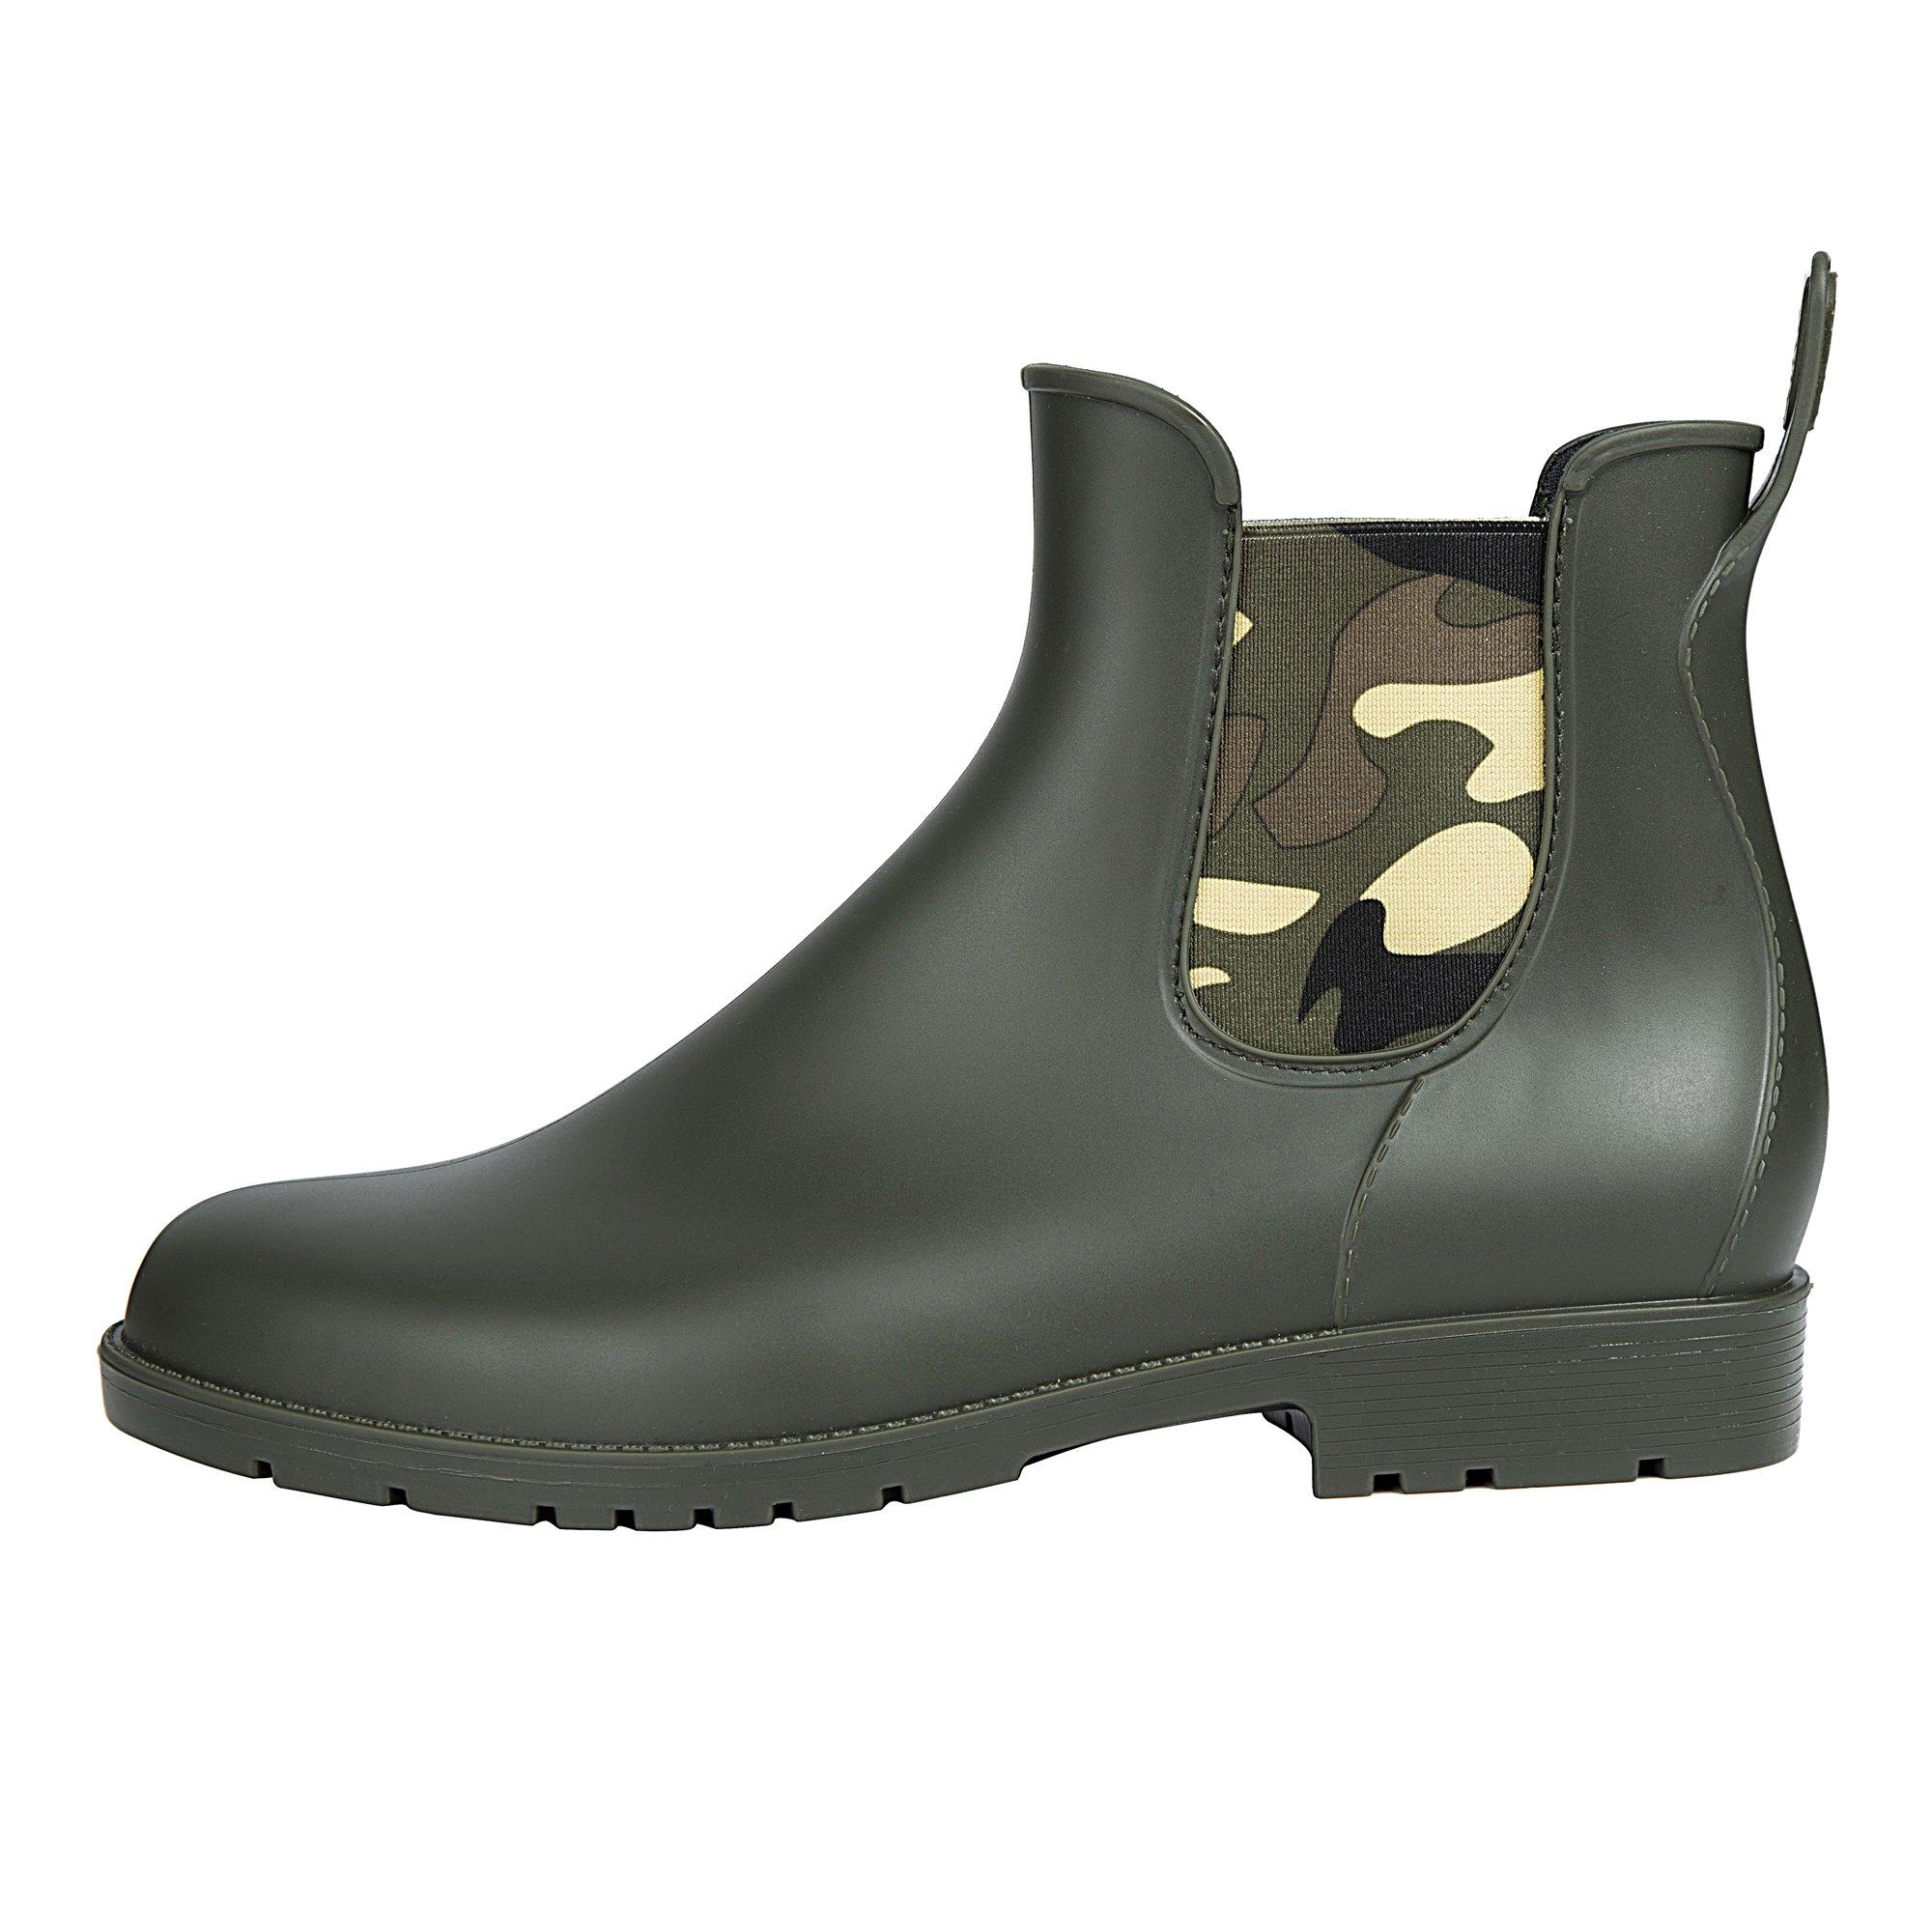 Asgard Girl's Waterproof Chelsea Rain Boots Short Ankel Snow Boots for Kids CA34 by Asgard (Image #2)